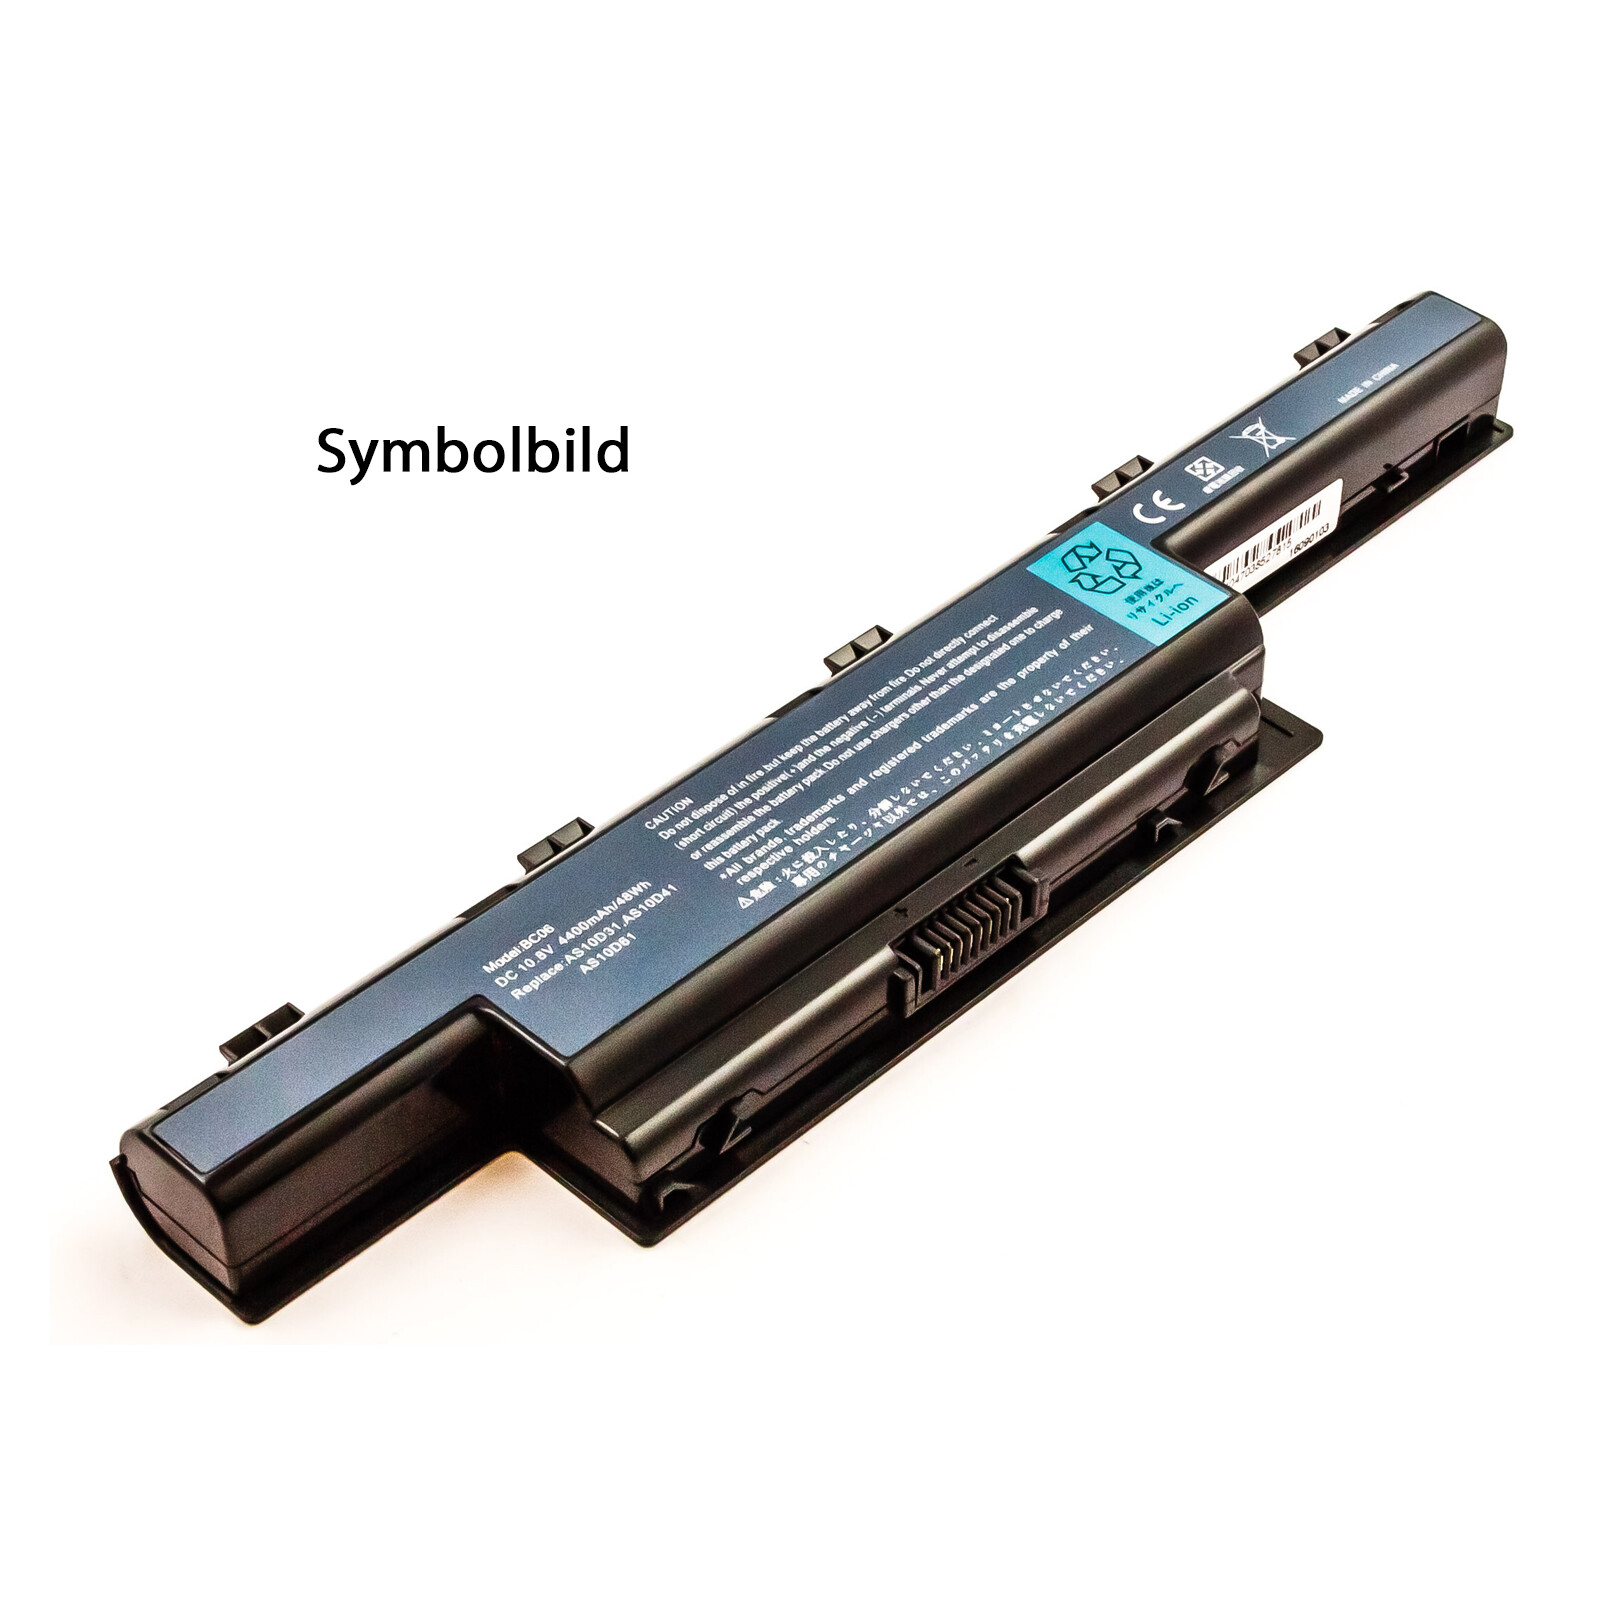 AGI Akku Asus VivoBook X751LN-TY100H